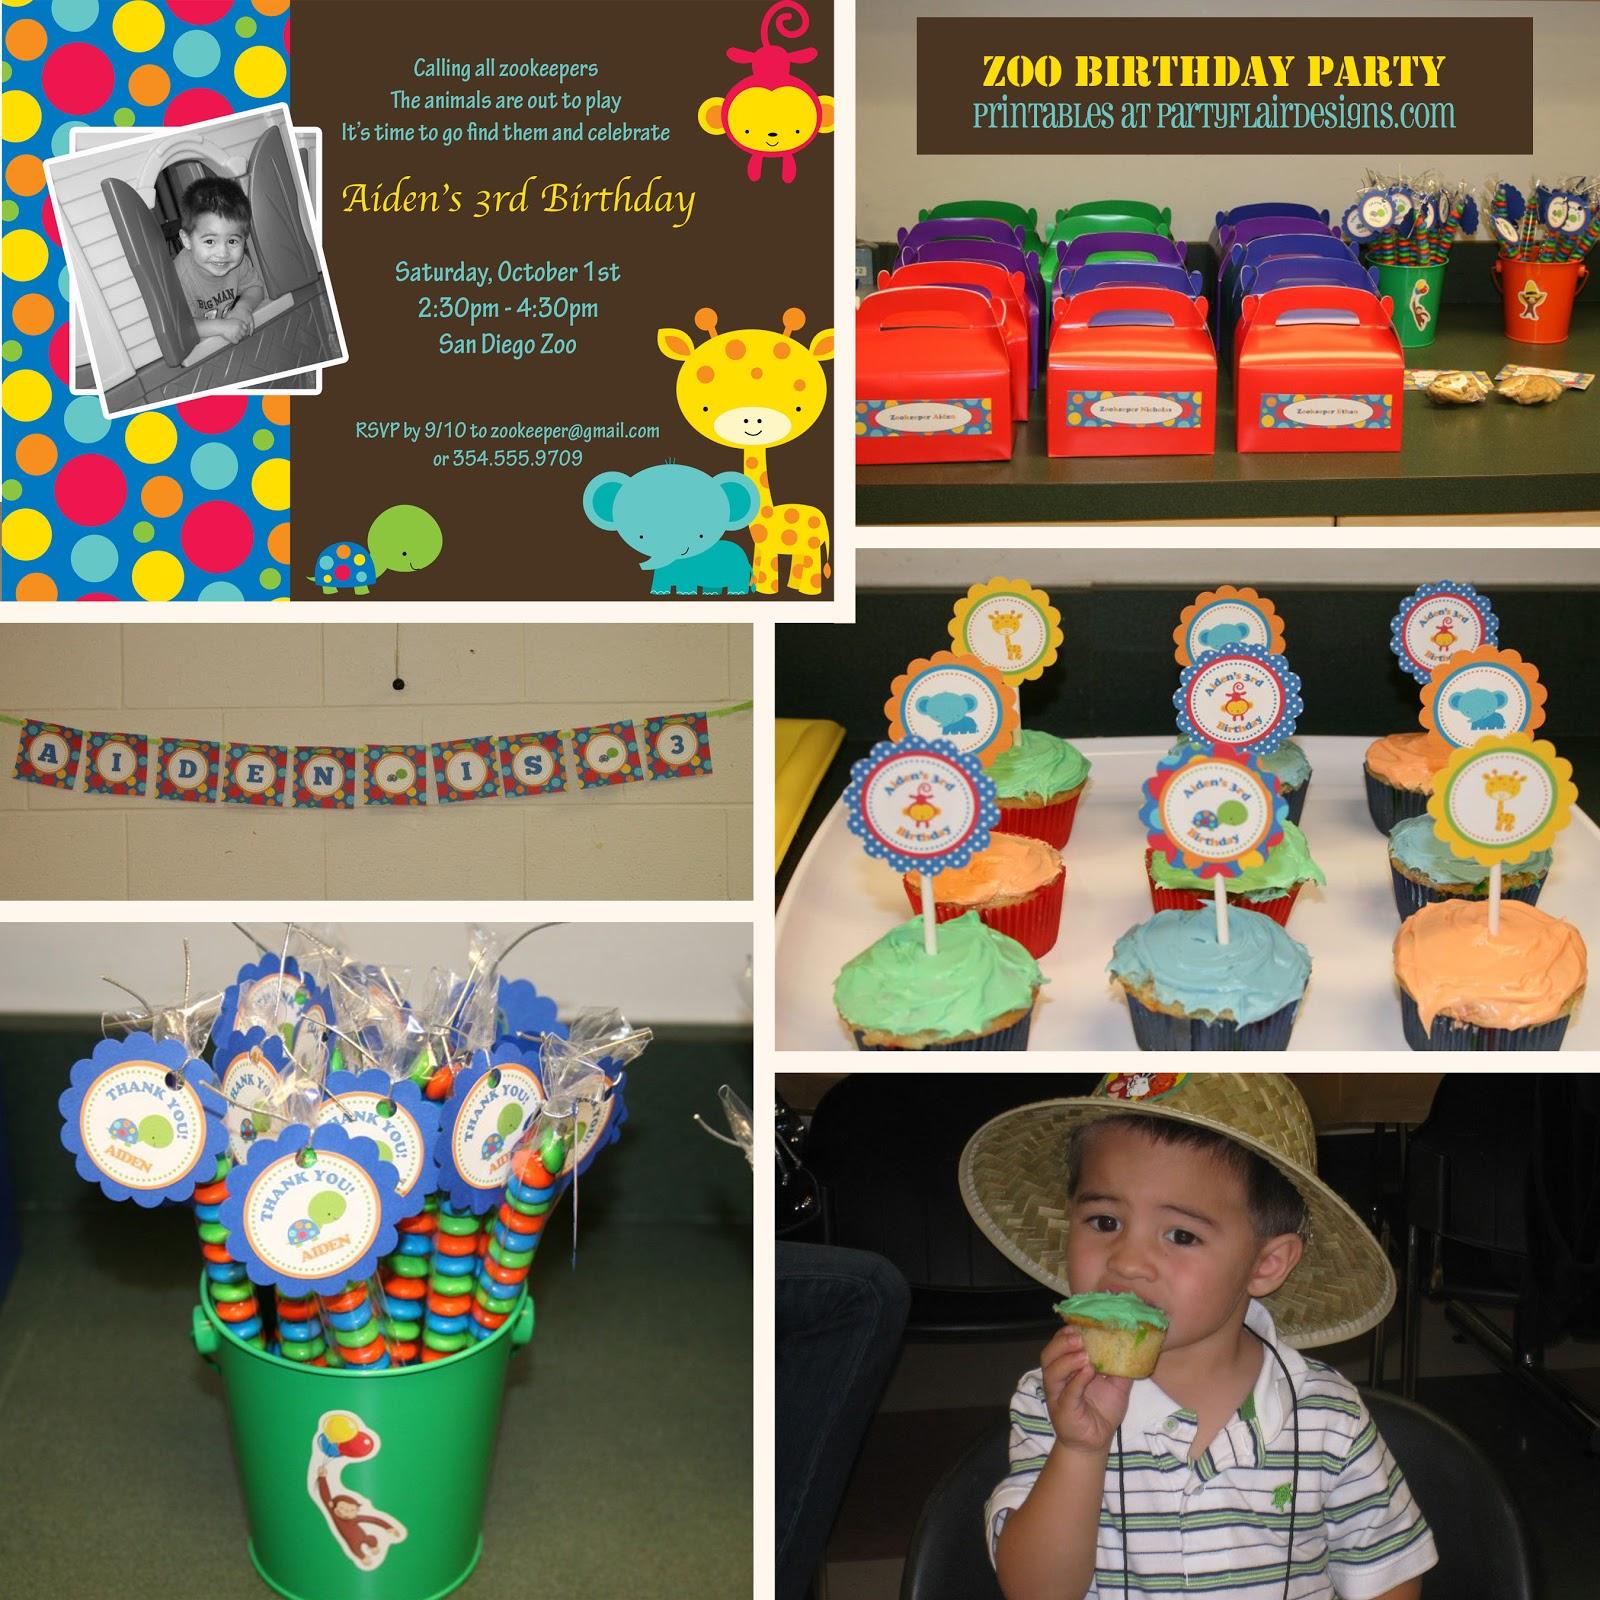 Party Flair Designs: PARTY RECAP: Zoo Birthday Party